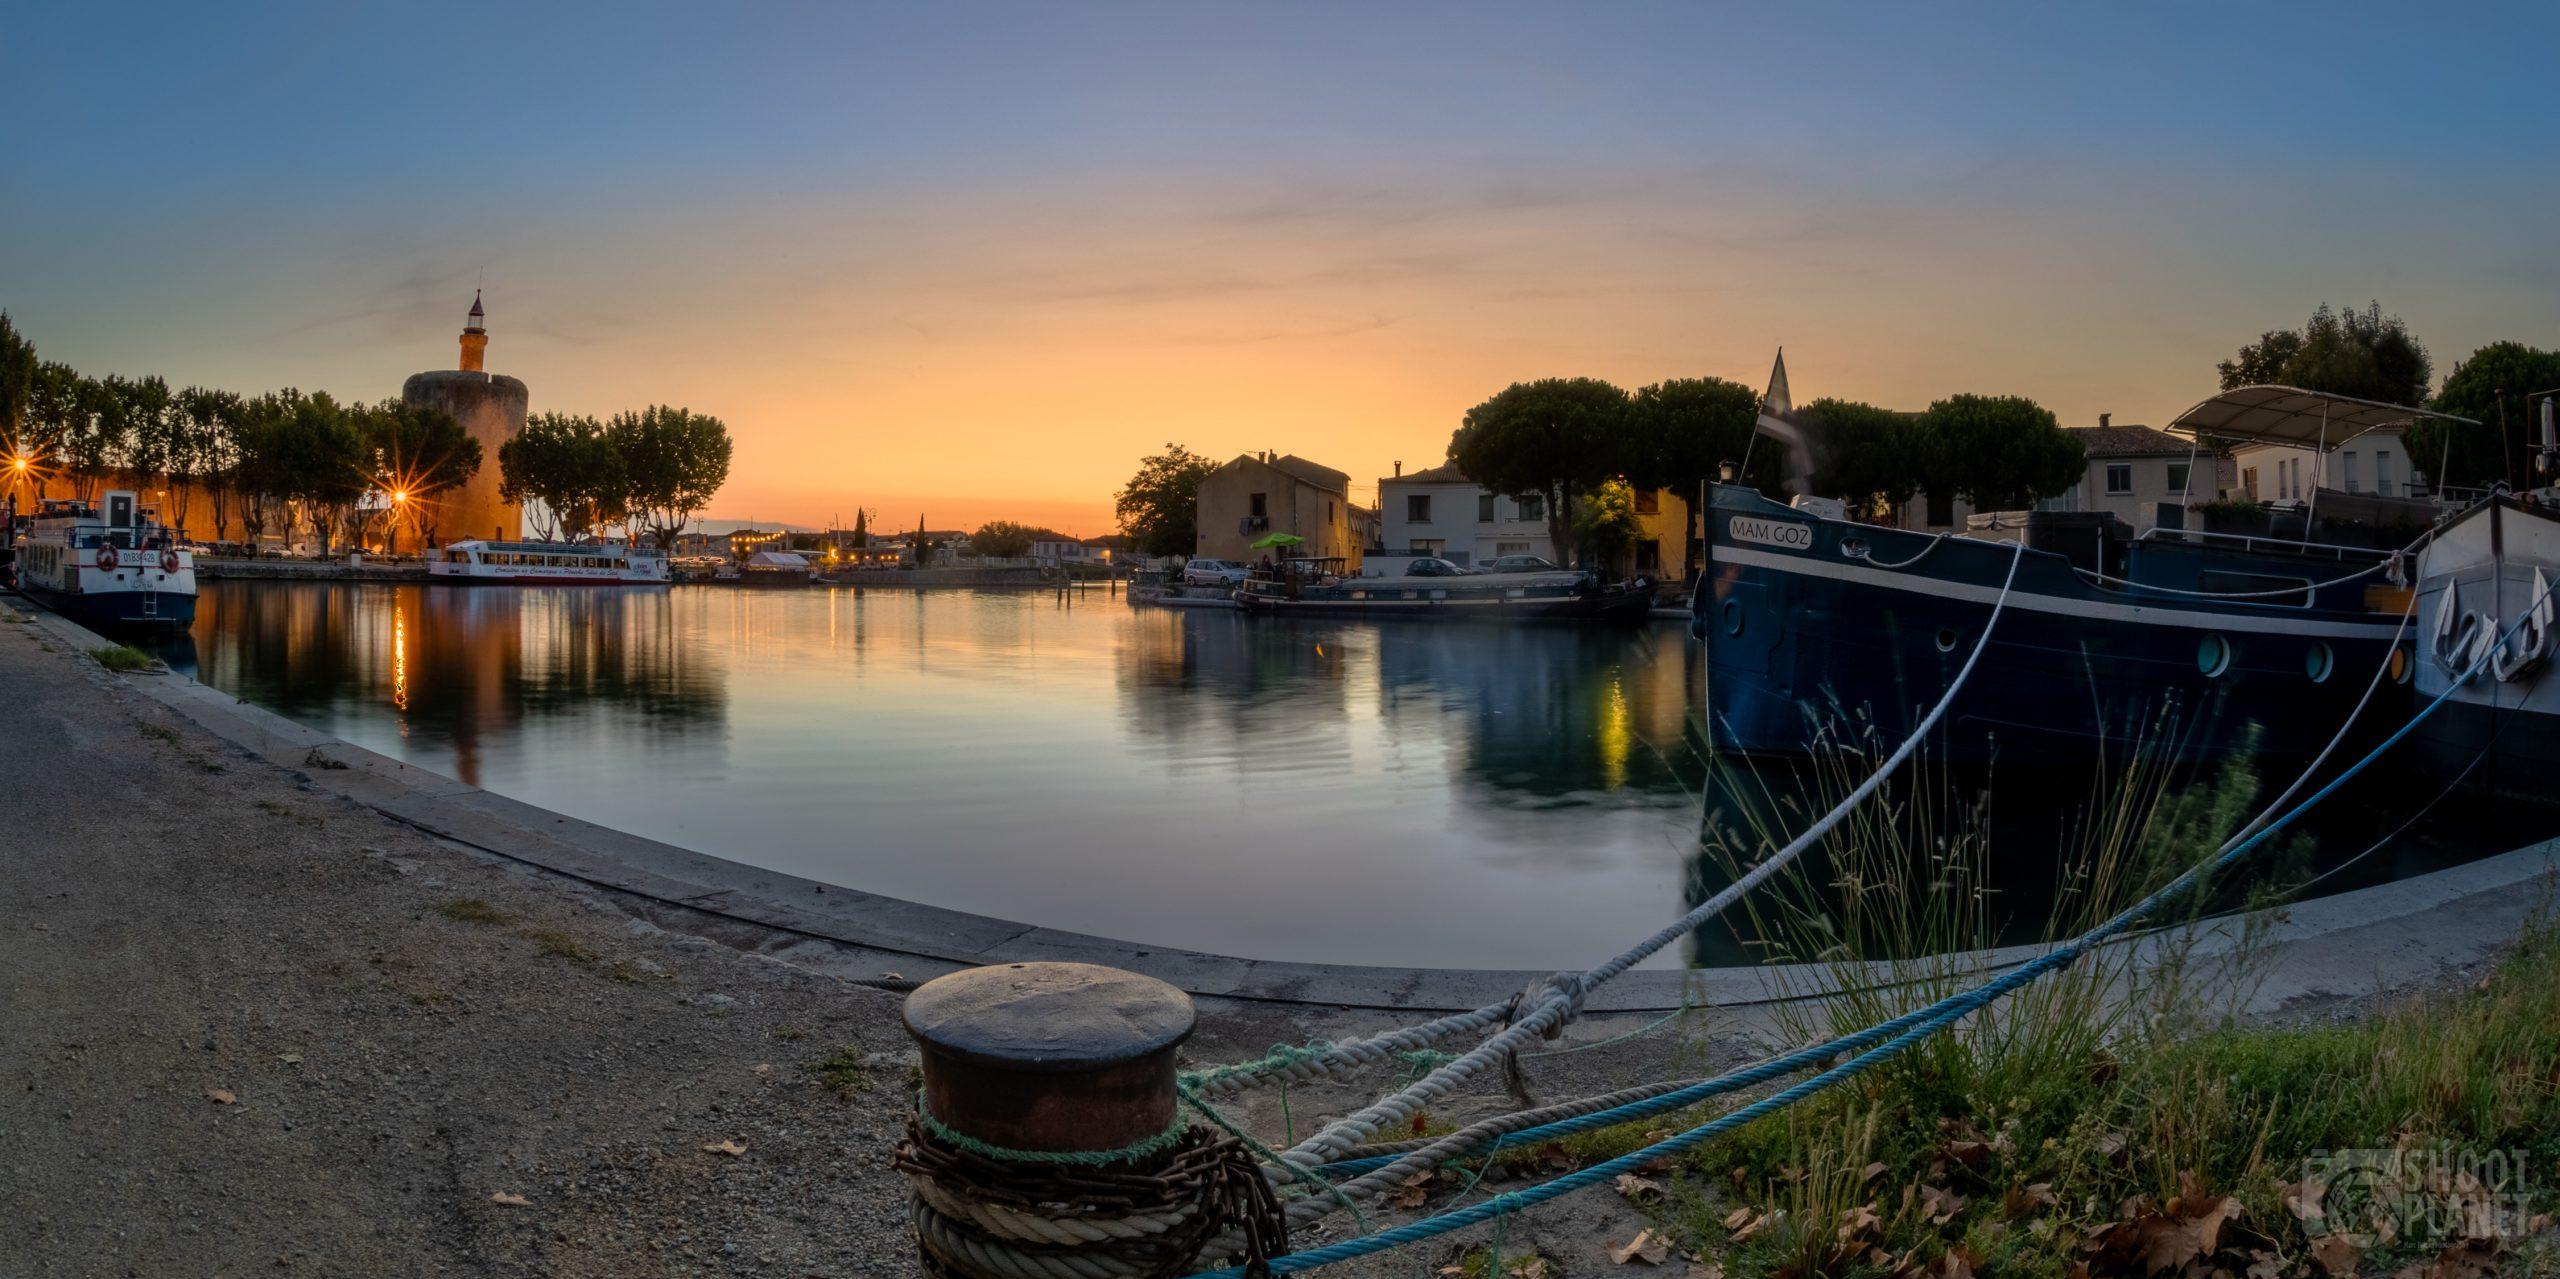 Aigues-Mortes marina and medieval city sunset, Camargue